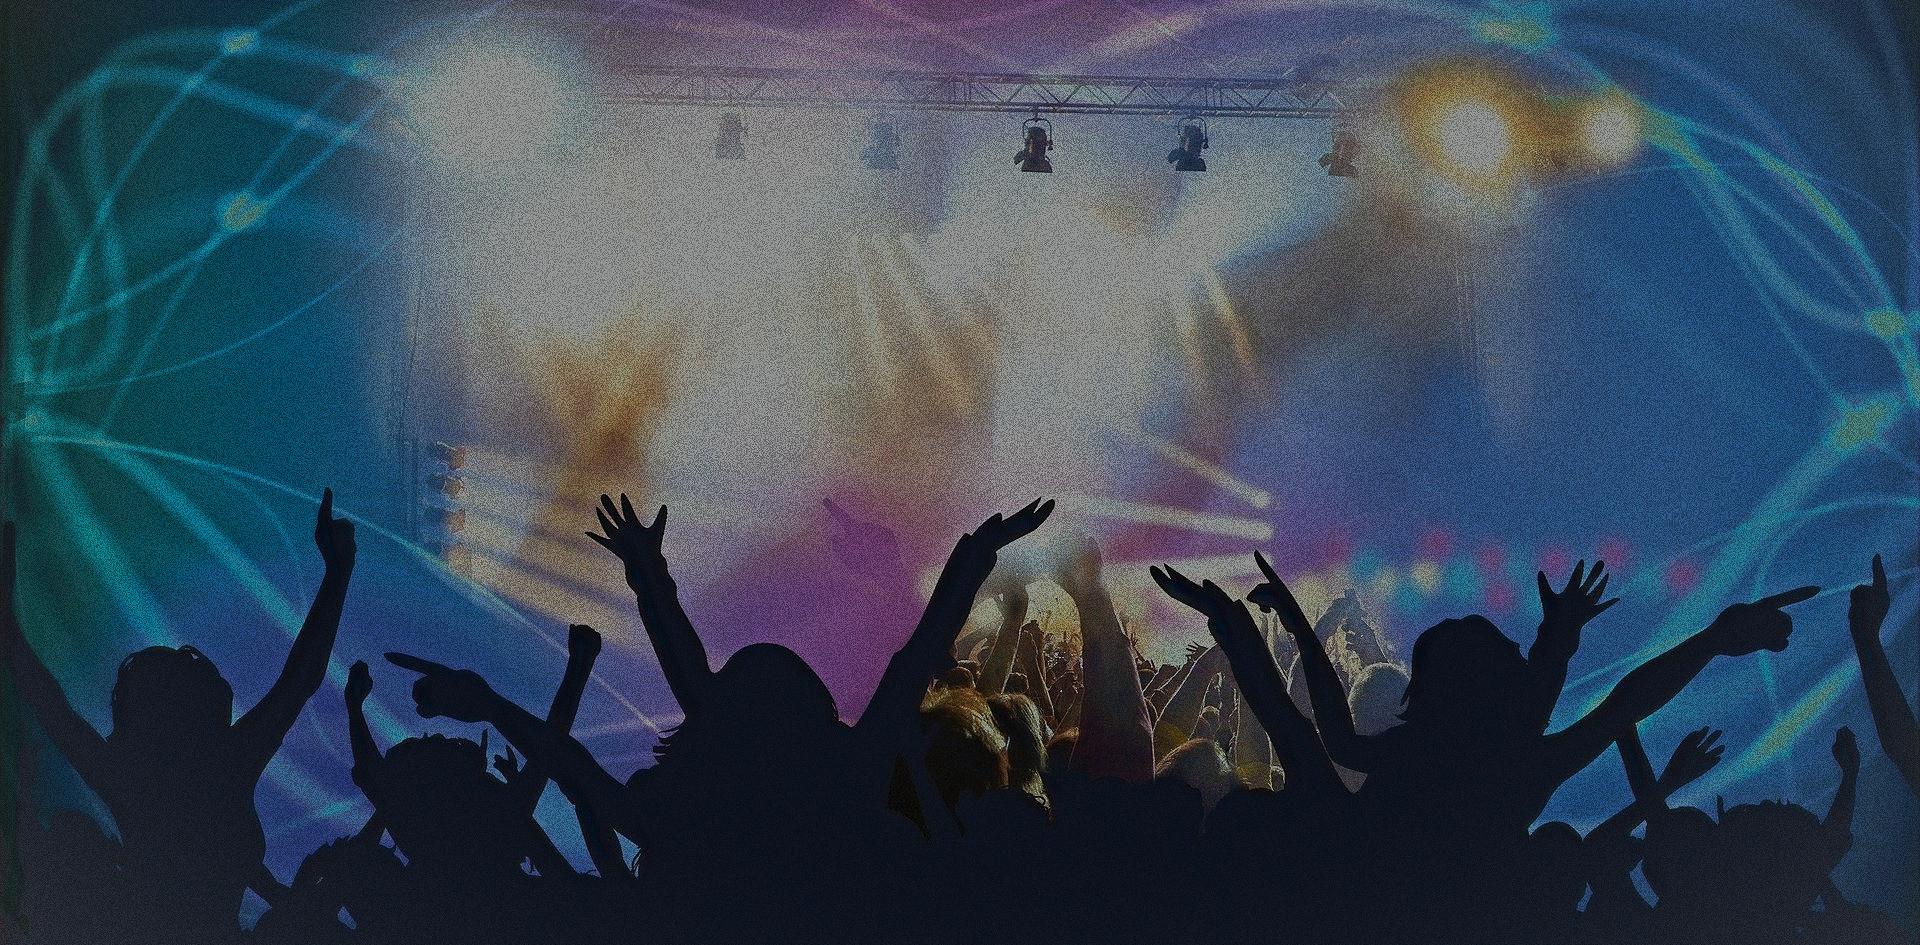 live-concert-388160_1920_edited.jpg